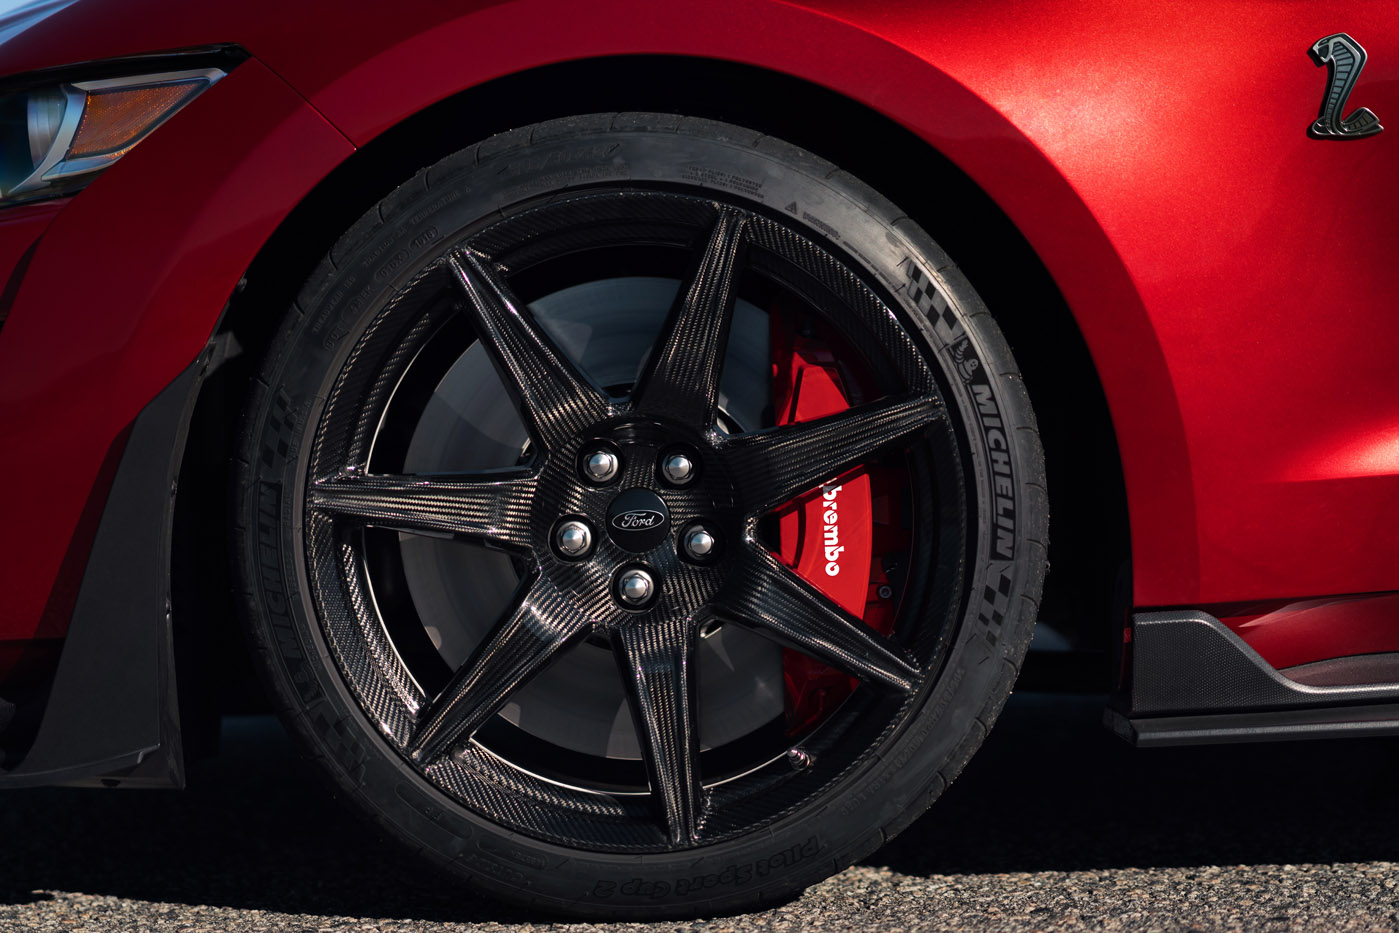 Felgi i hamulce - Ford Mustang Shelby GT500 - premiera